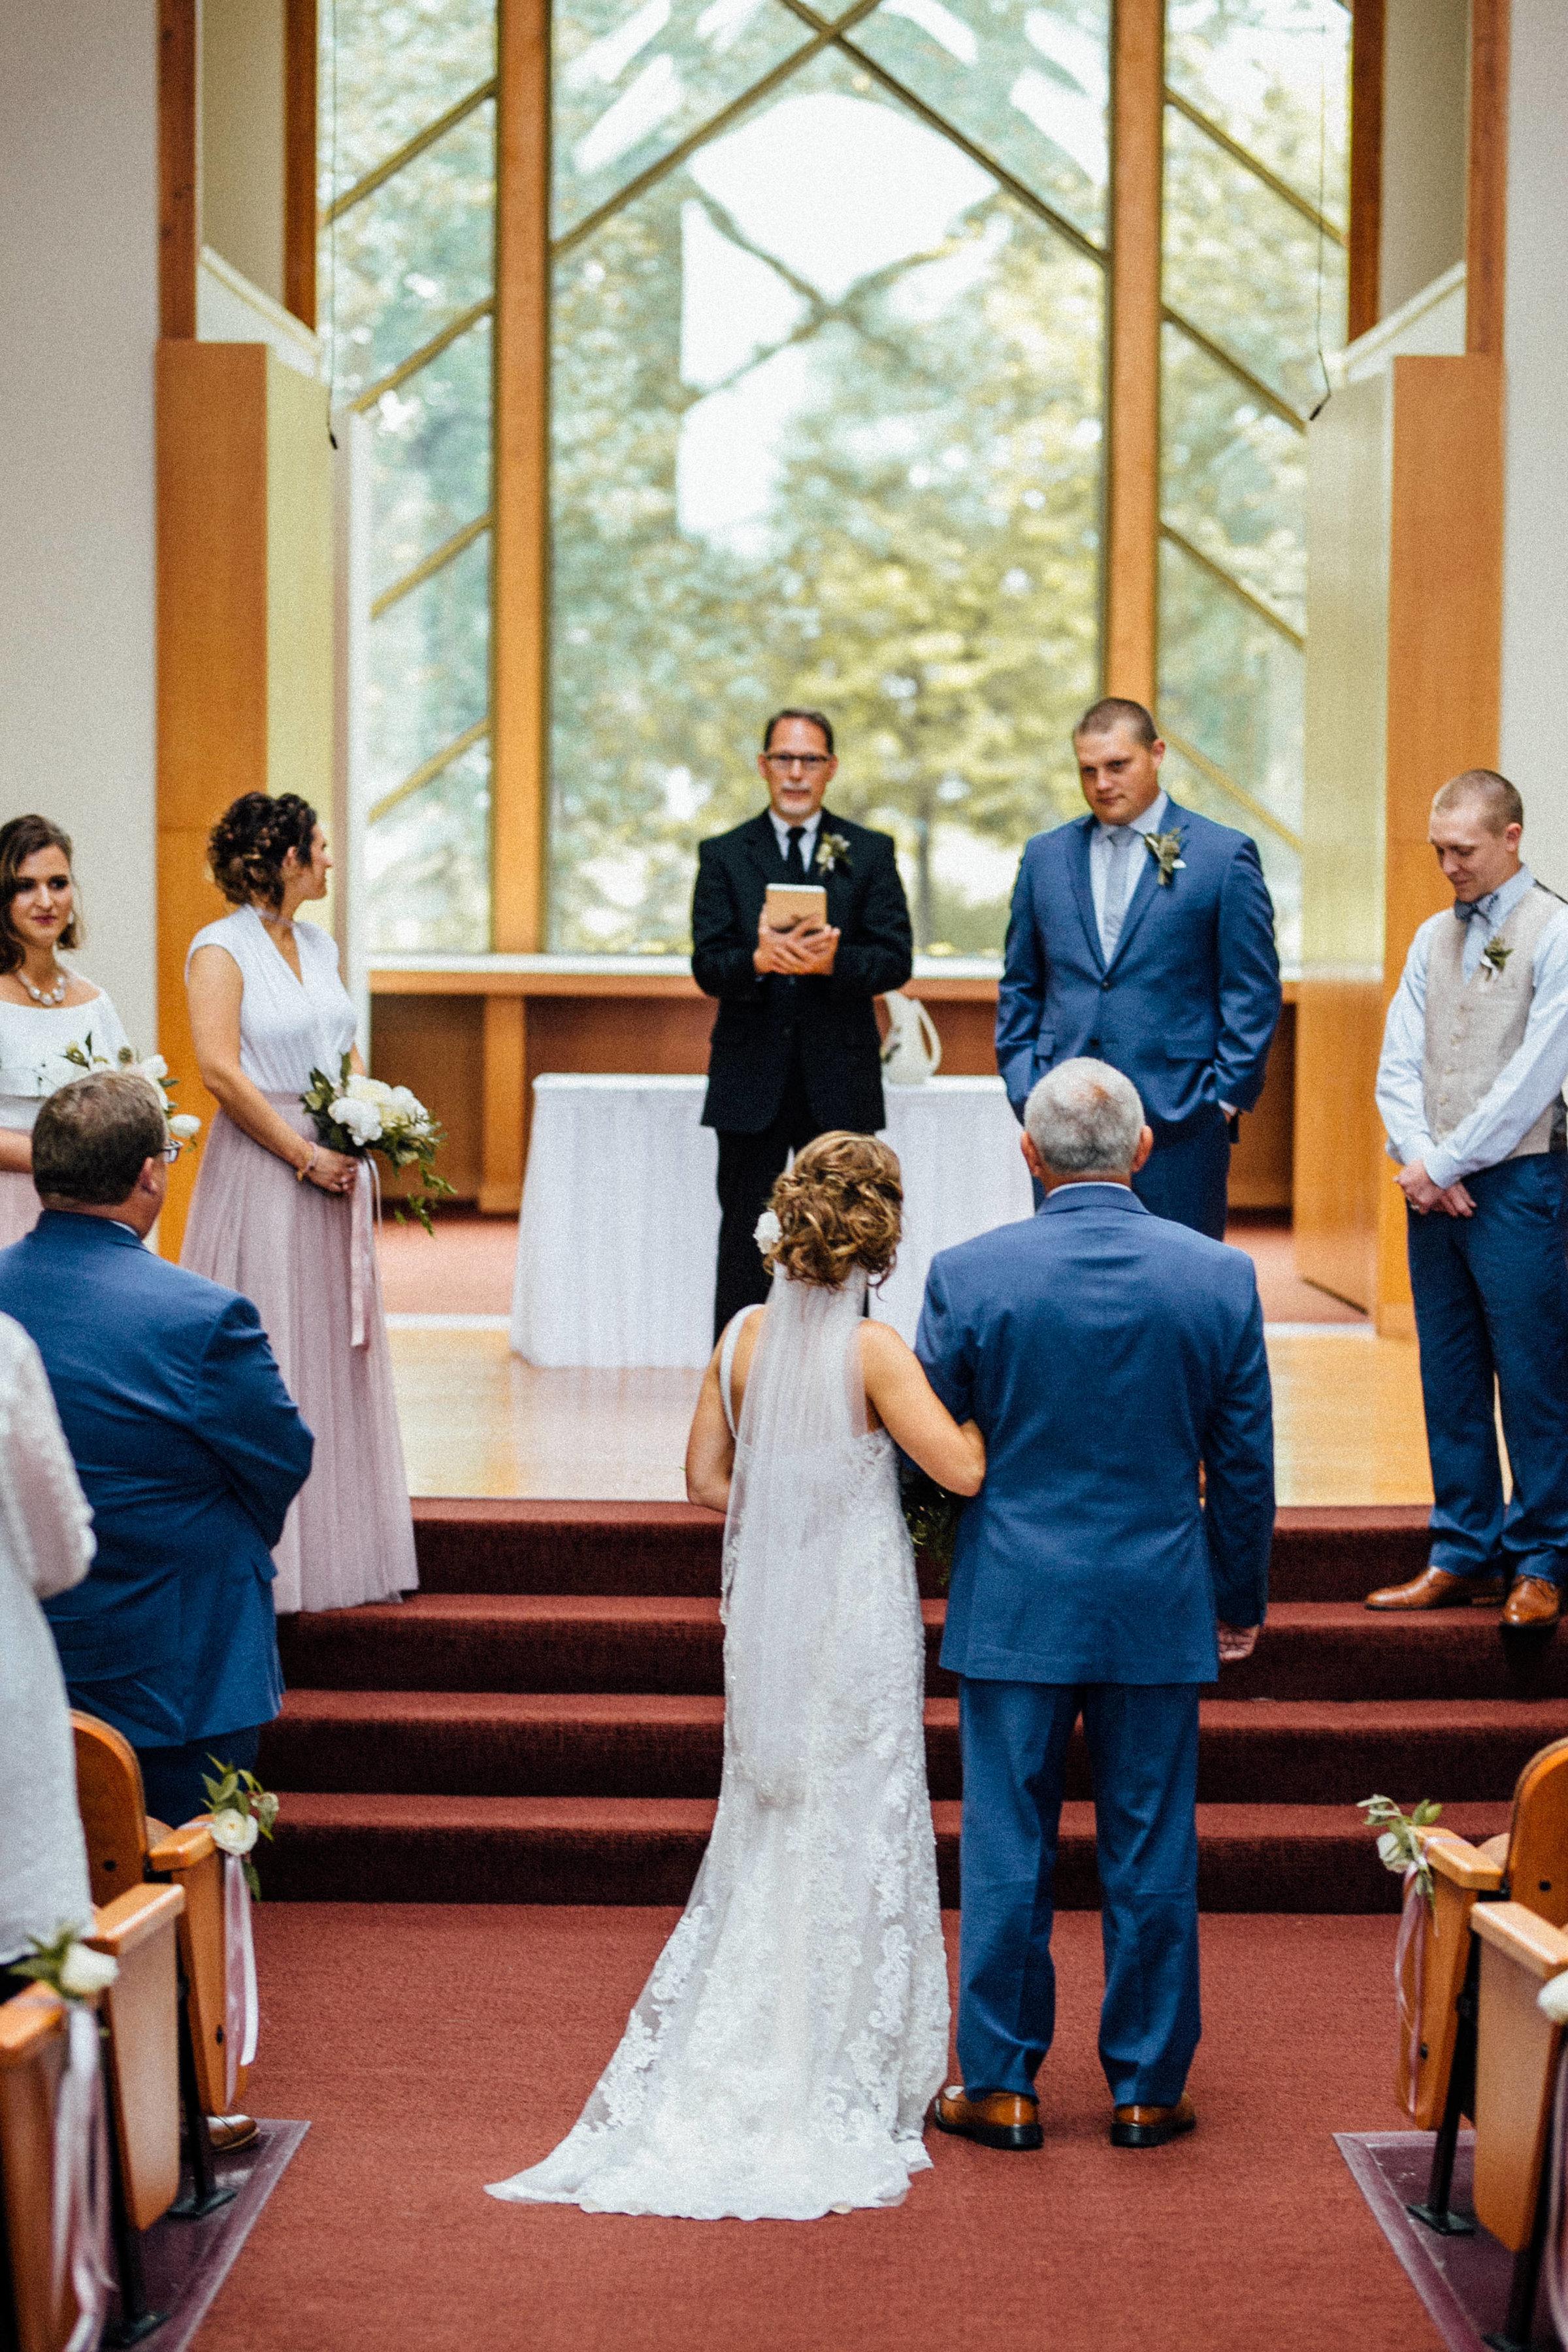 Whitney-Kevin-Ceremony-Michigan-Wedding-Photographer-46.jpg